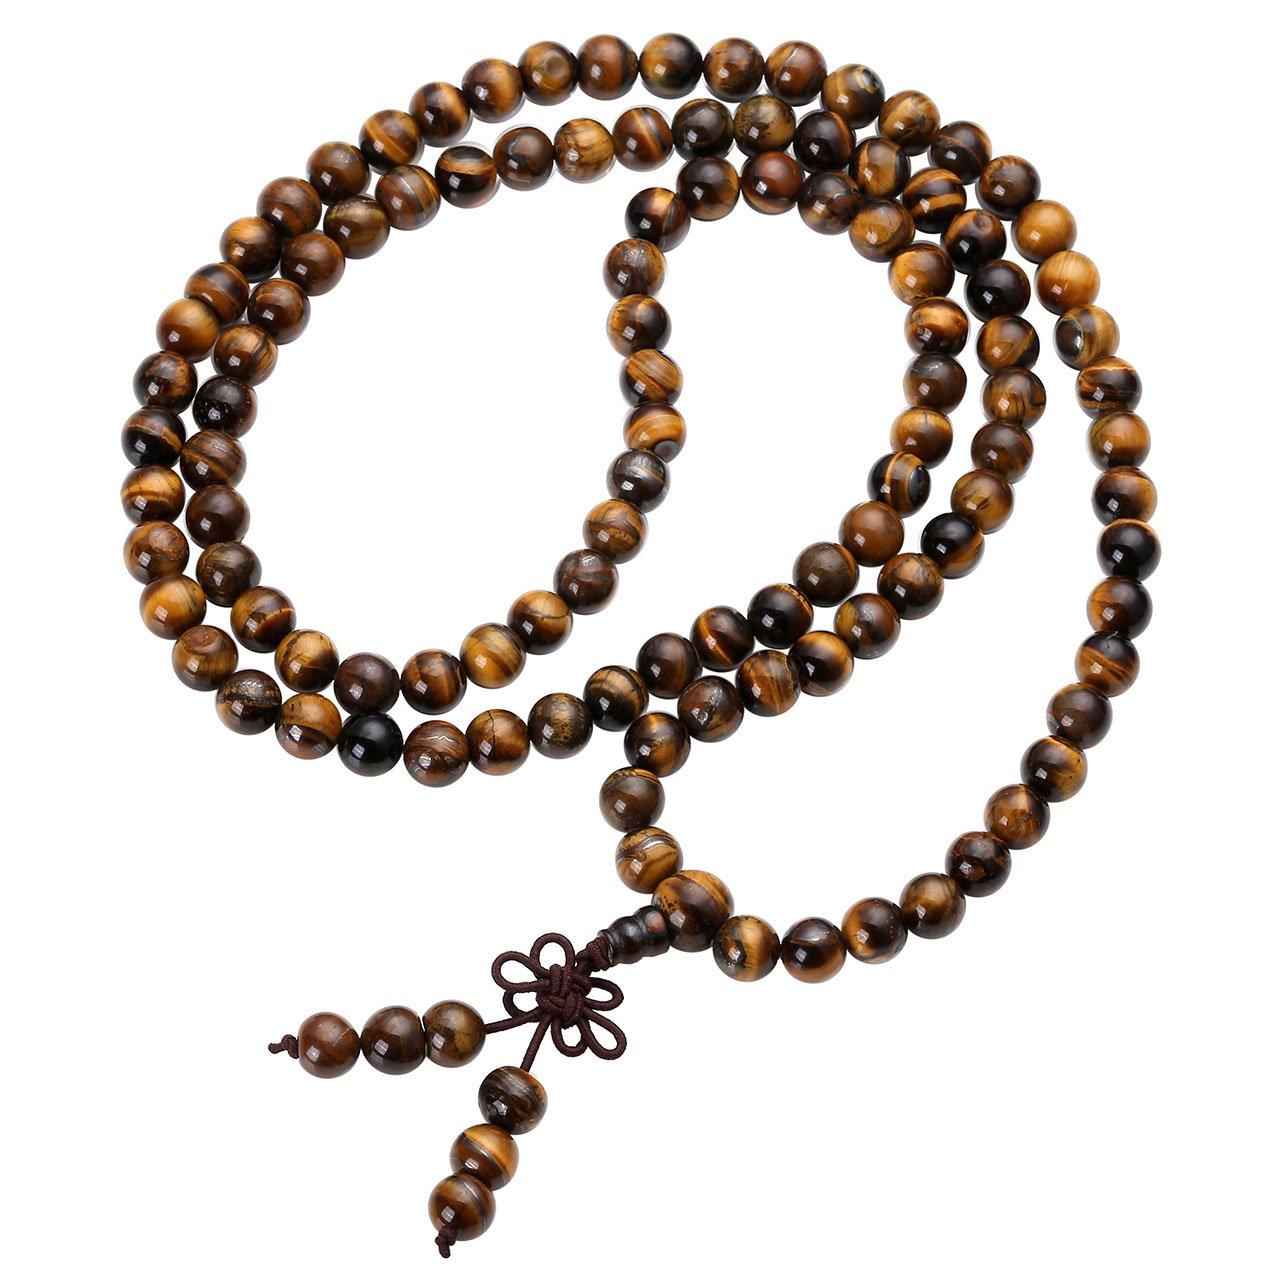 Jovivi Tibetan 8mm 108 Natural Tiger Eye Gemstone Beads Prayer Mala Bracelet Necklace by Jovivi